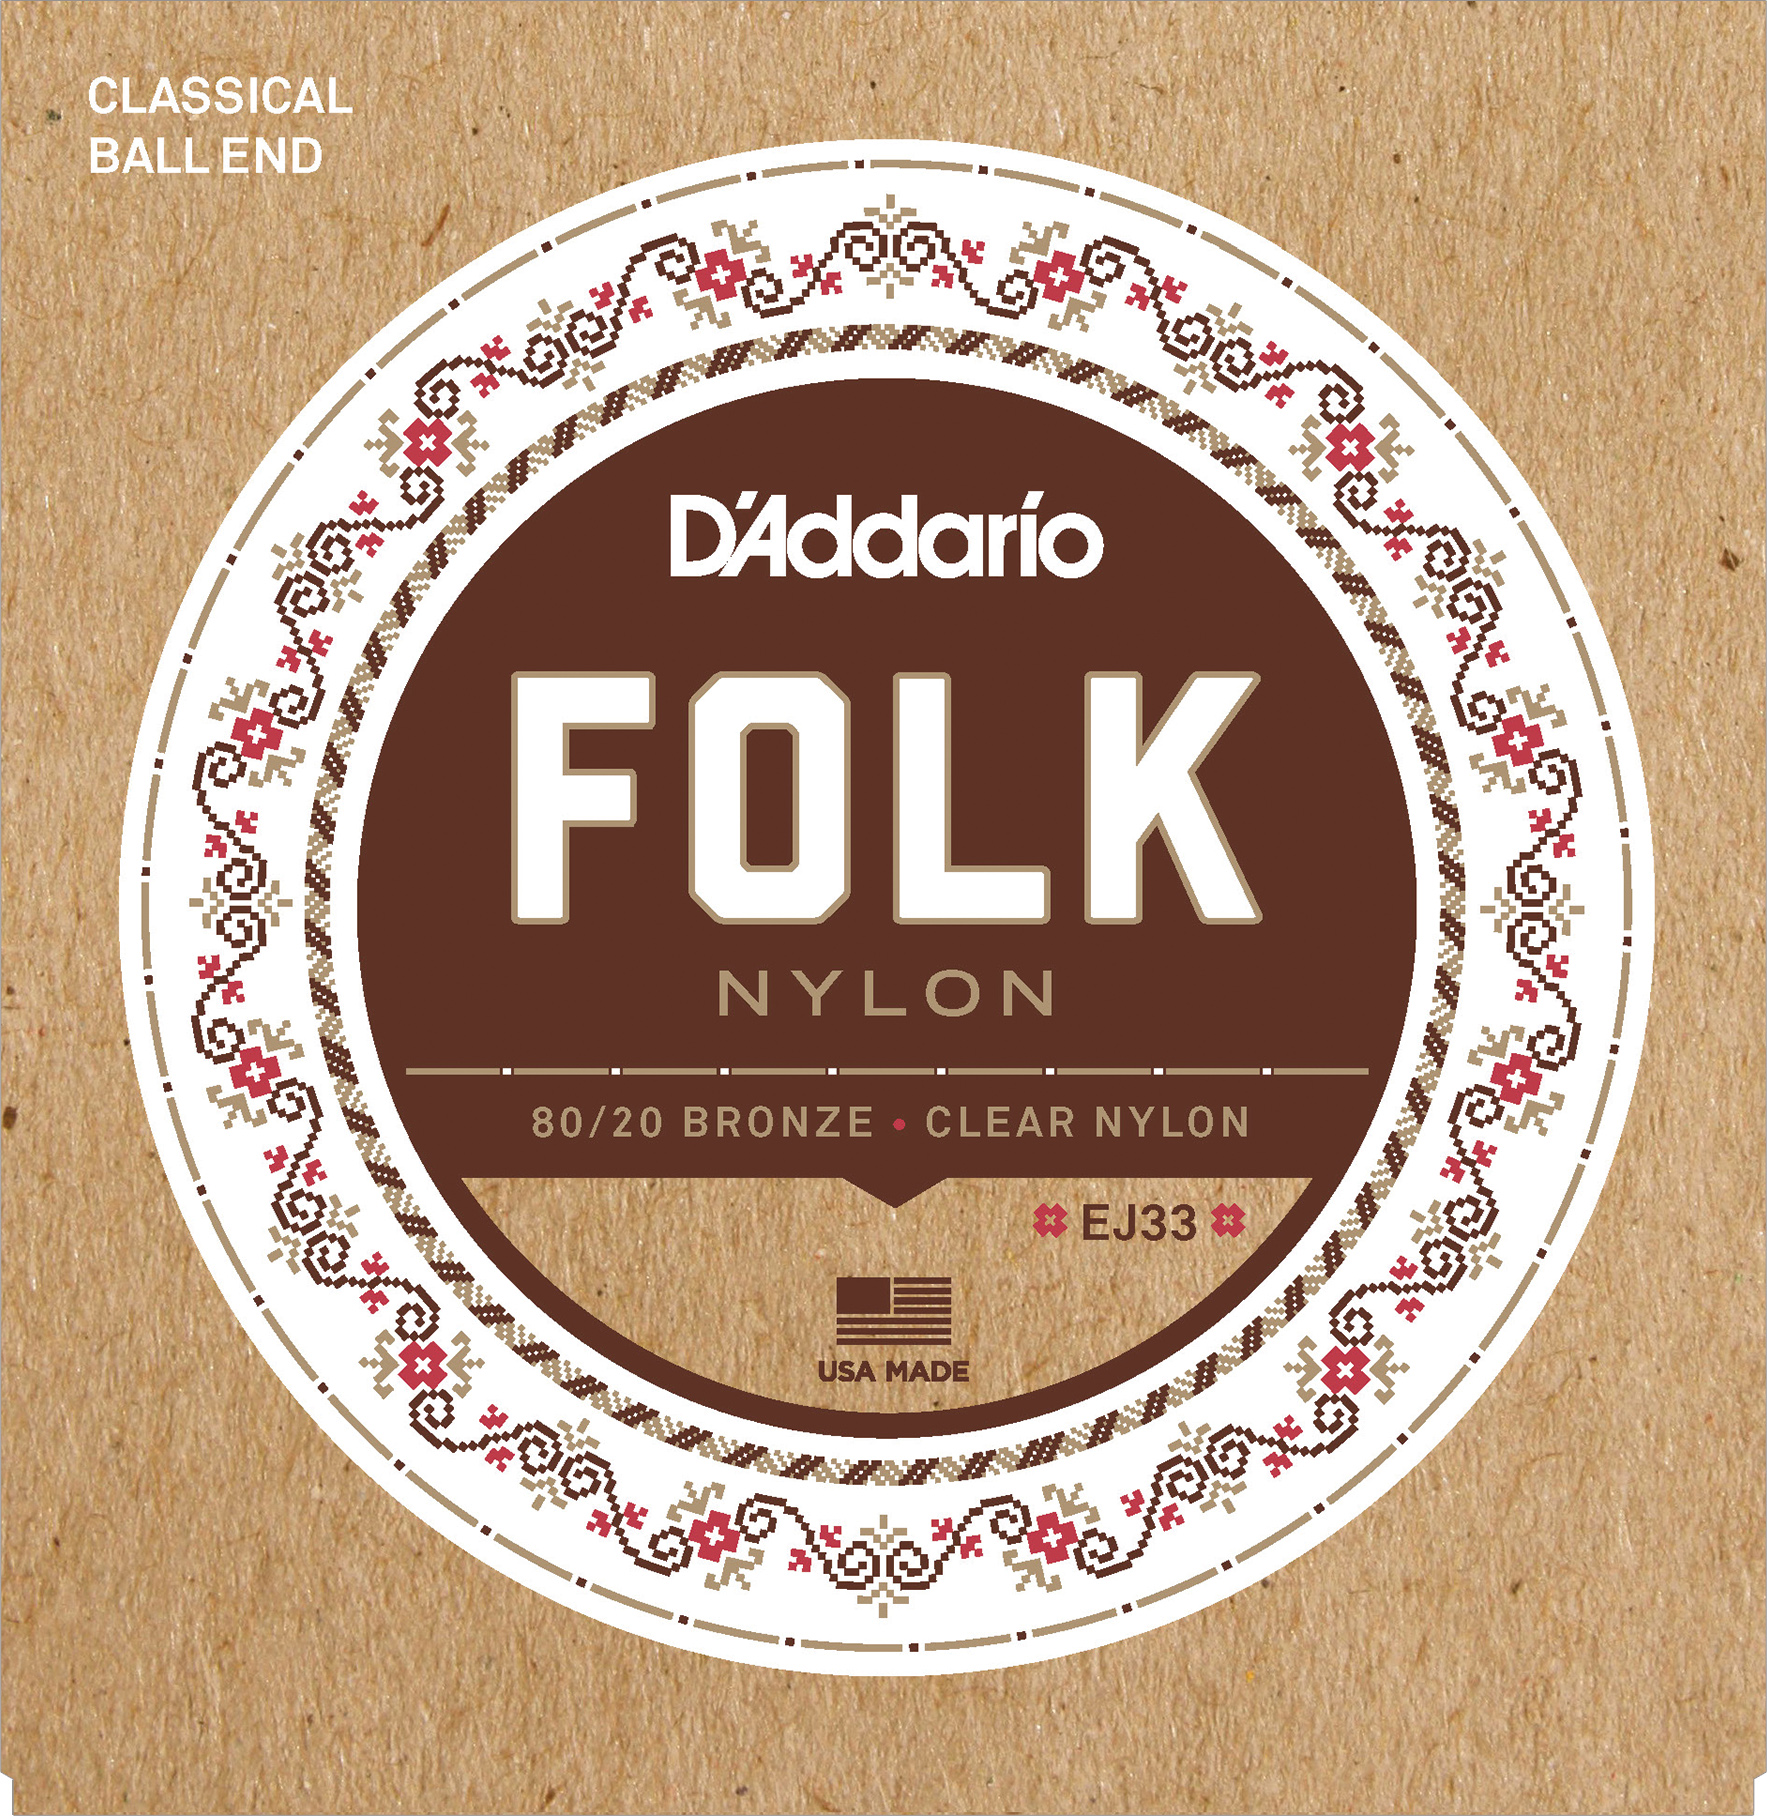 D'Addario Folk Nylon EJ33 Classical Guitar Strings, Ball End, 80/20 Bronze, Clear Nylon Trebles